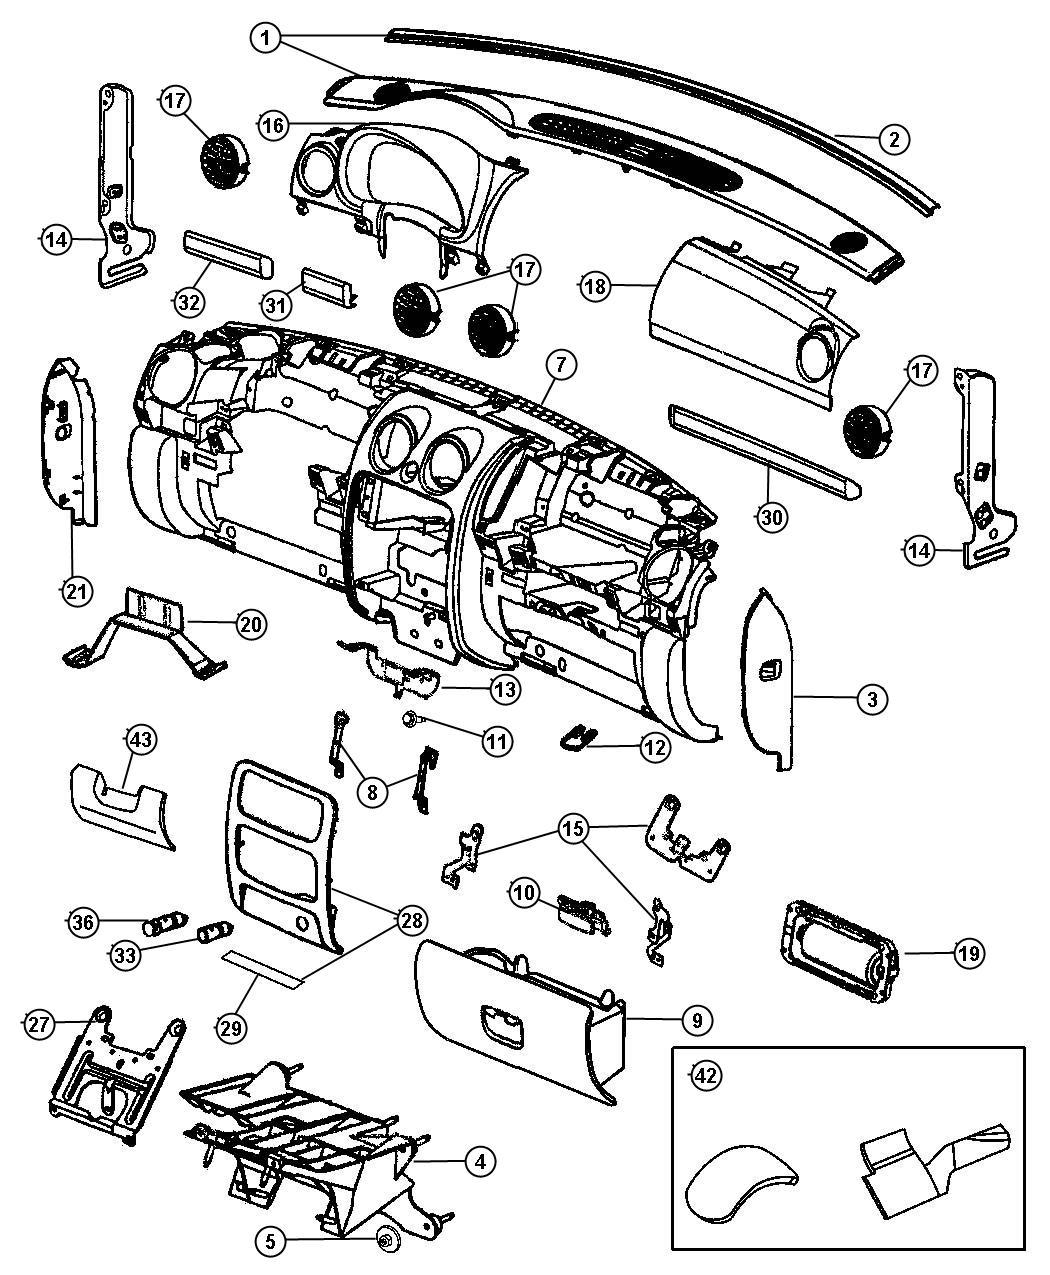 2005 Jeep Liberty Latch. Glovebox door. [d5, db], [d5